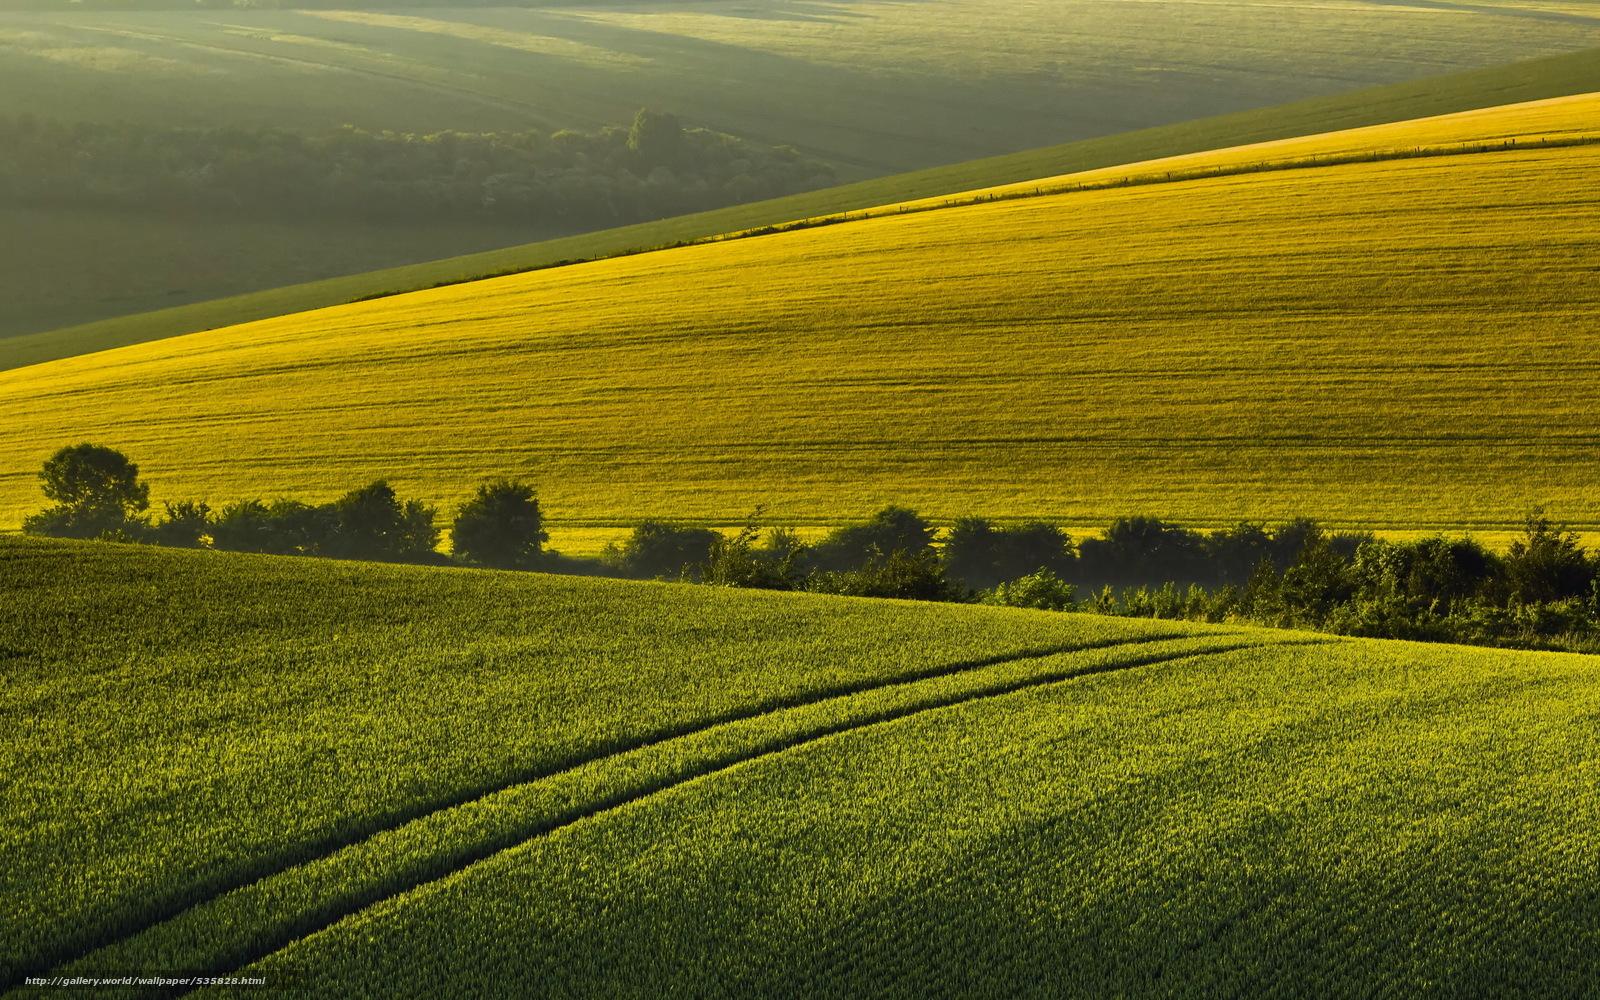 Download wallpaper morning,  field,  summer,  Hills free desktop wallpaper in the resolution 2560x1600 — picture №535828